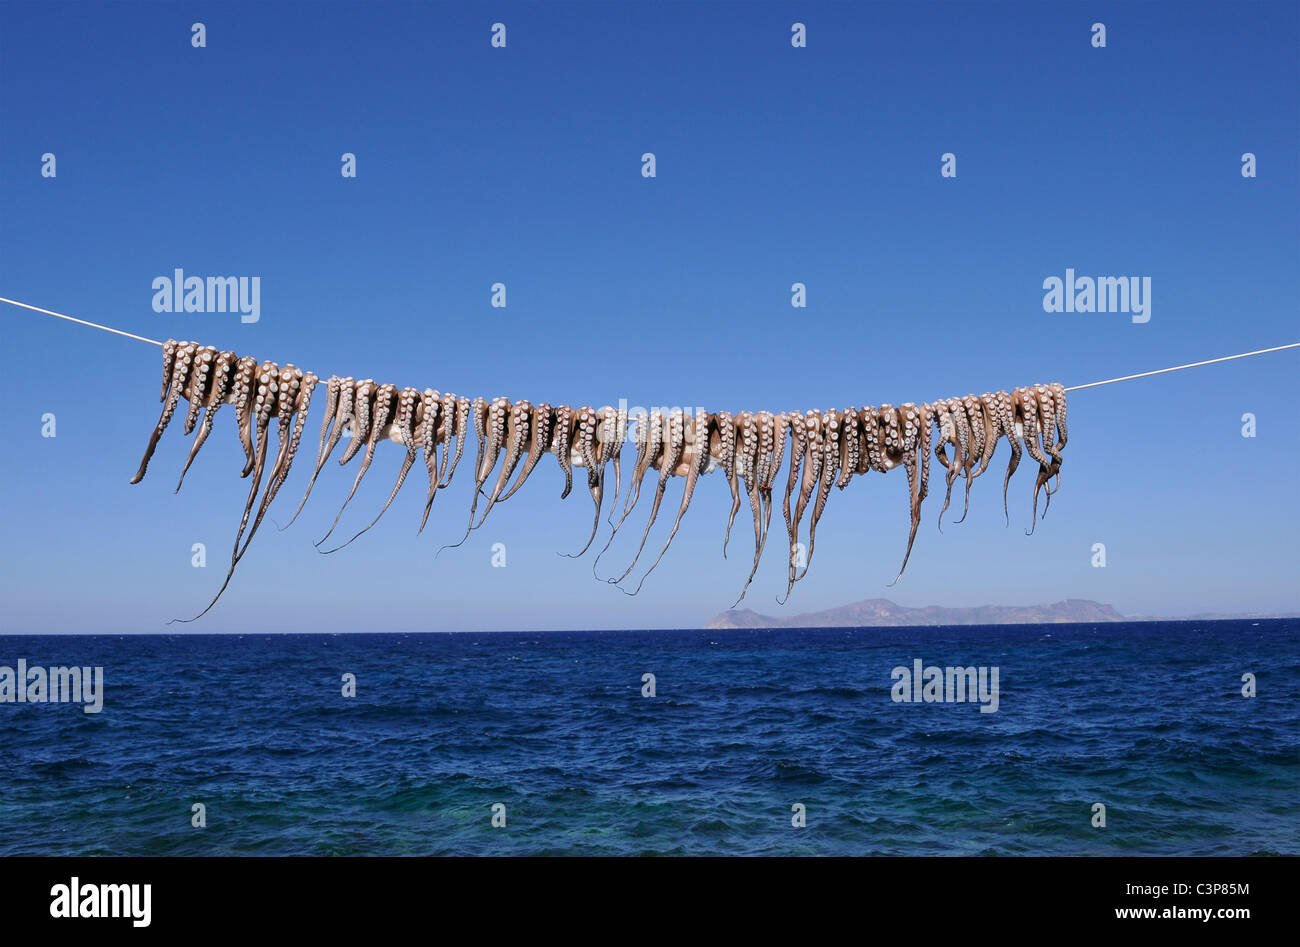 octopi hanging on clothesline - Stock Image